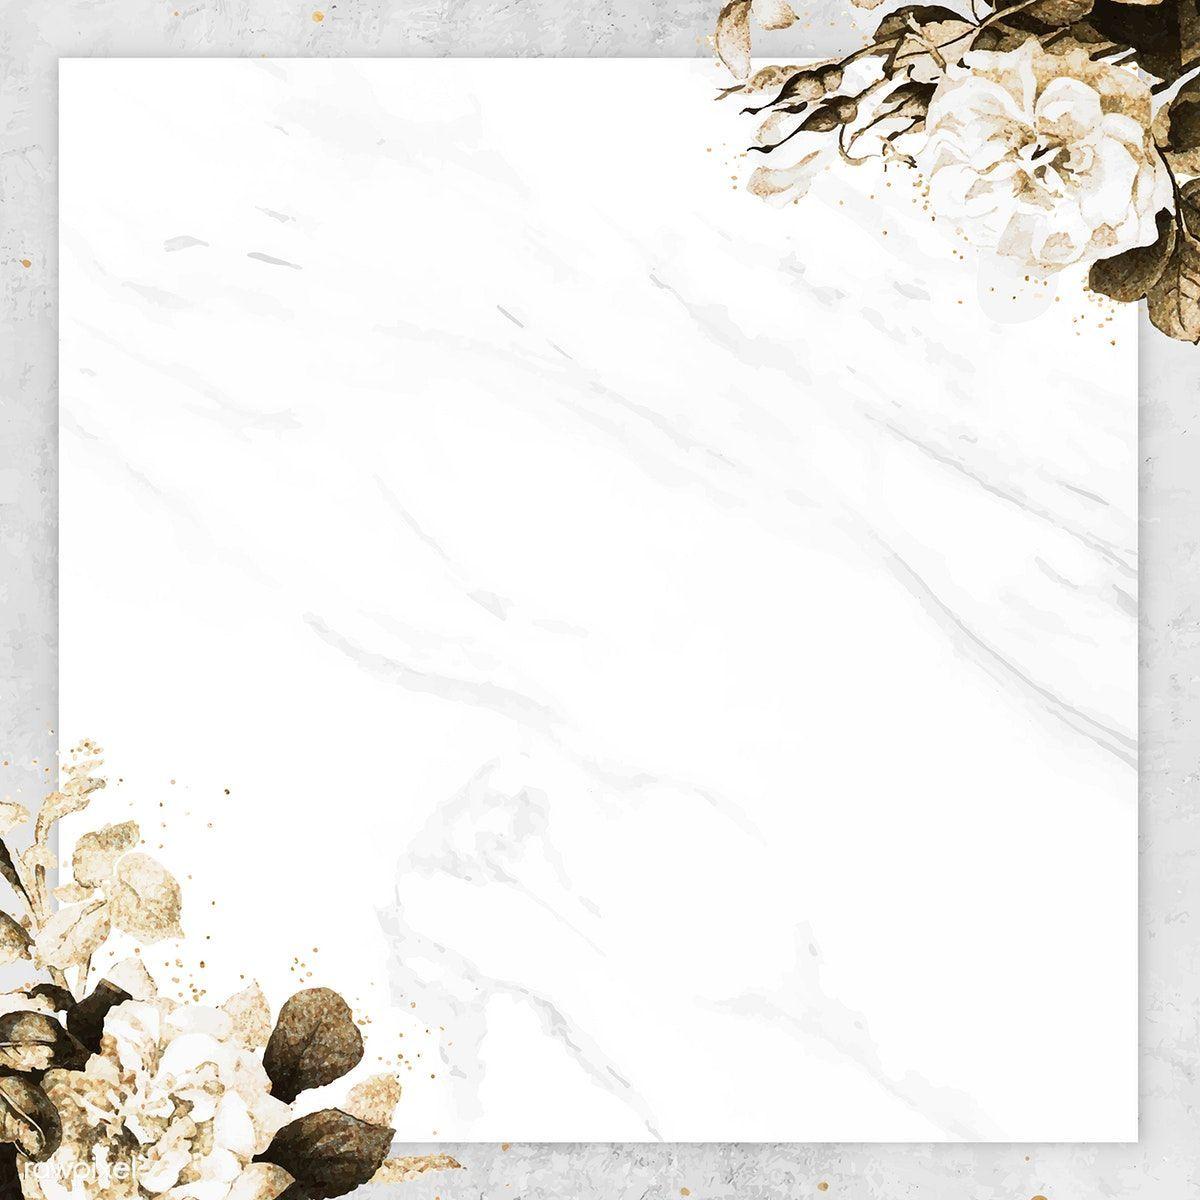 Download Premium Vector Of Blank Marble Textured Square Frame Vector Marbletexture Download Premium Vector Of Blank Marble Textured Sq Quadrat Vektoren Marmor